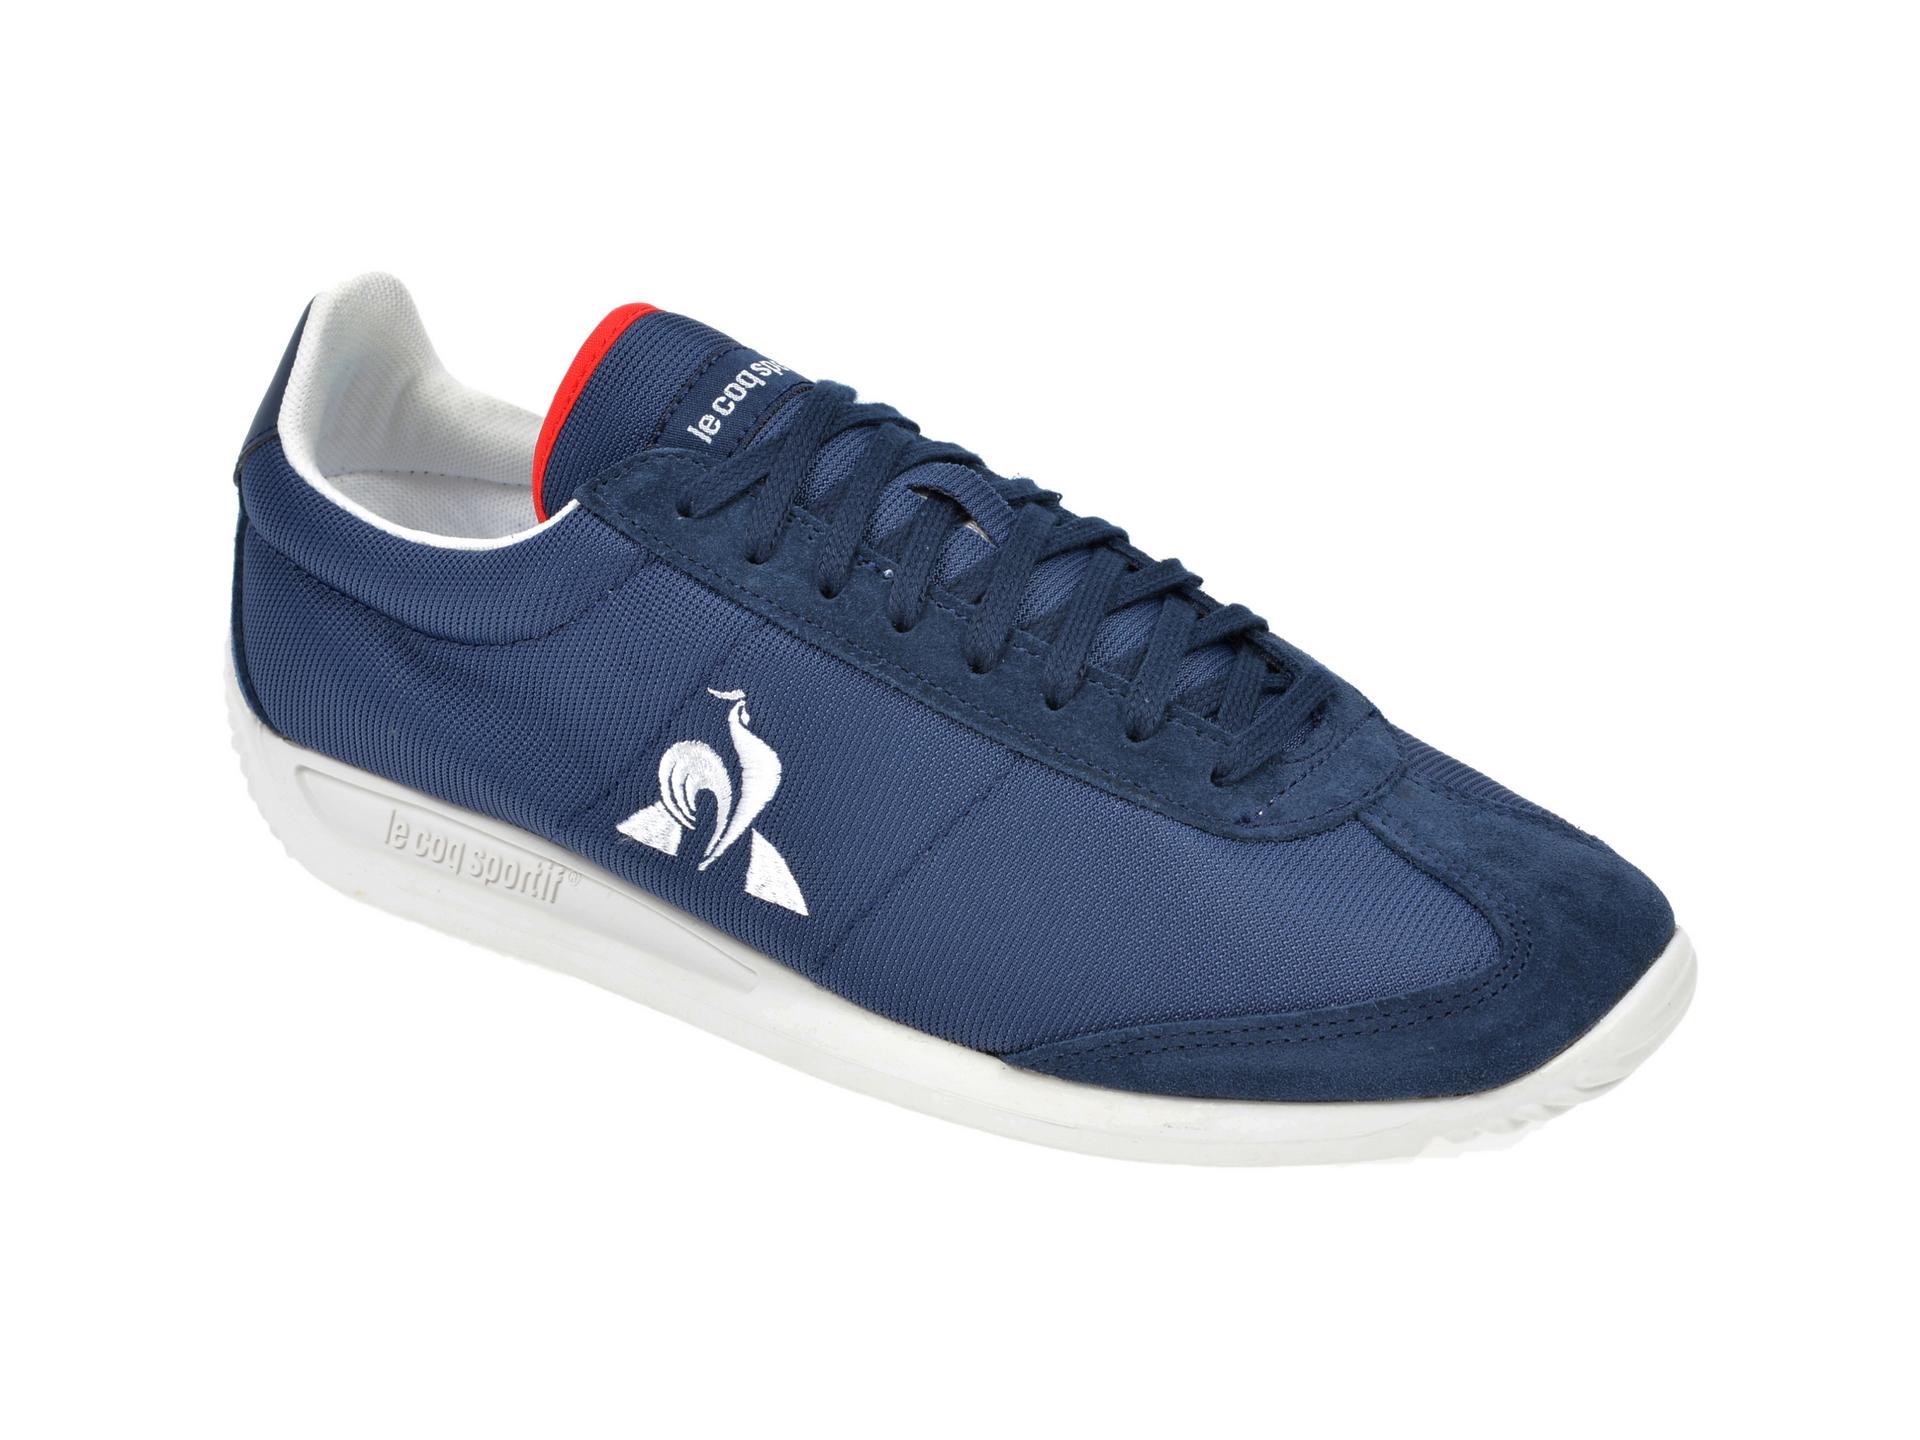 Pantofi sport LE COQ SPORTIF bleumarin, 2010302, din material textil imagine